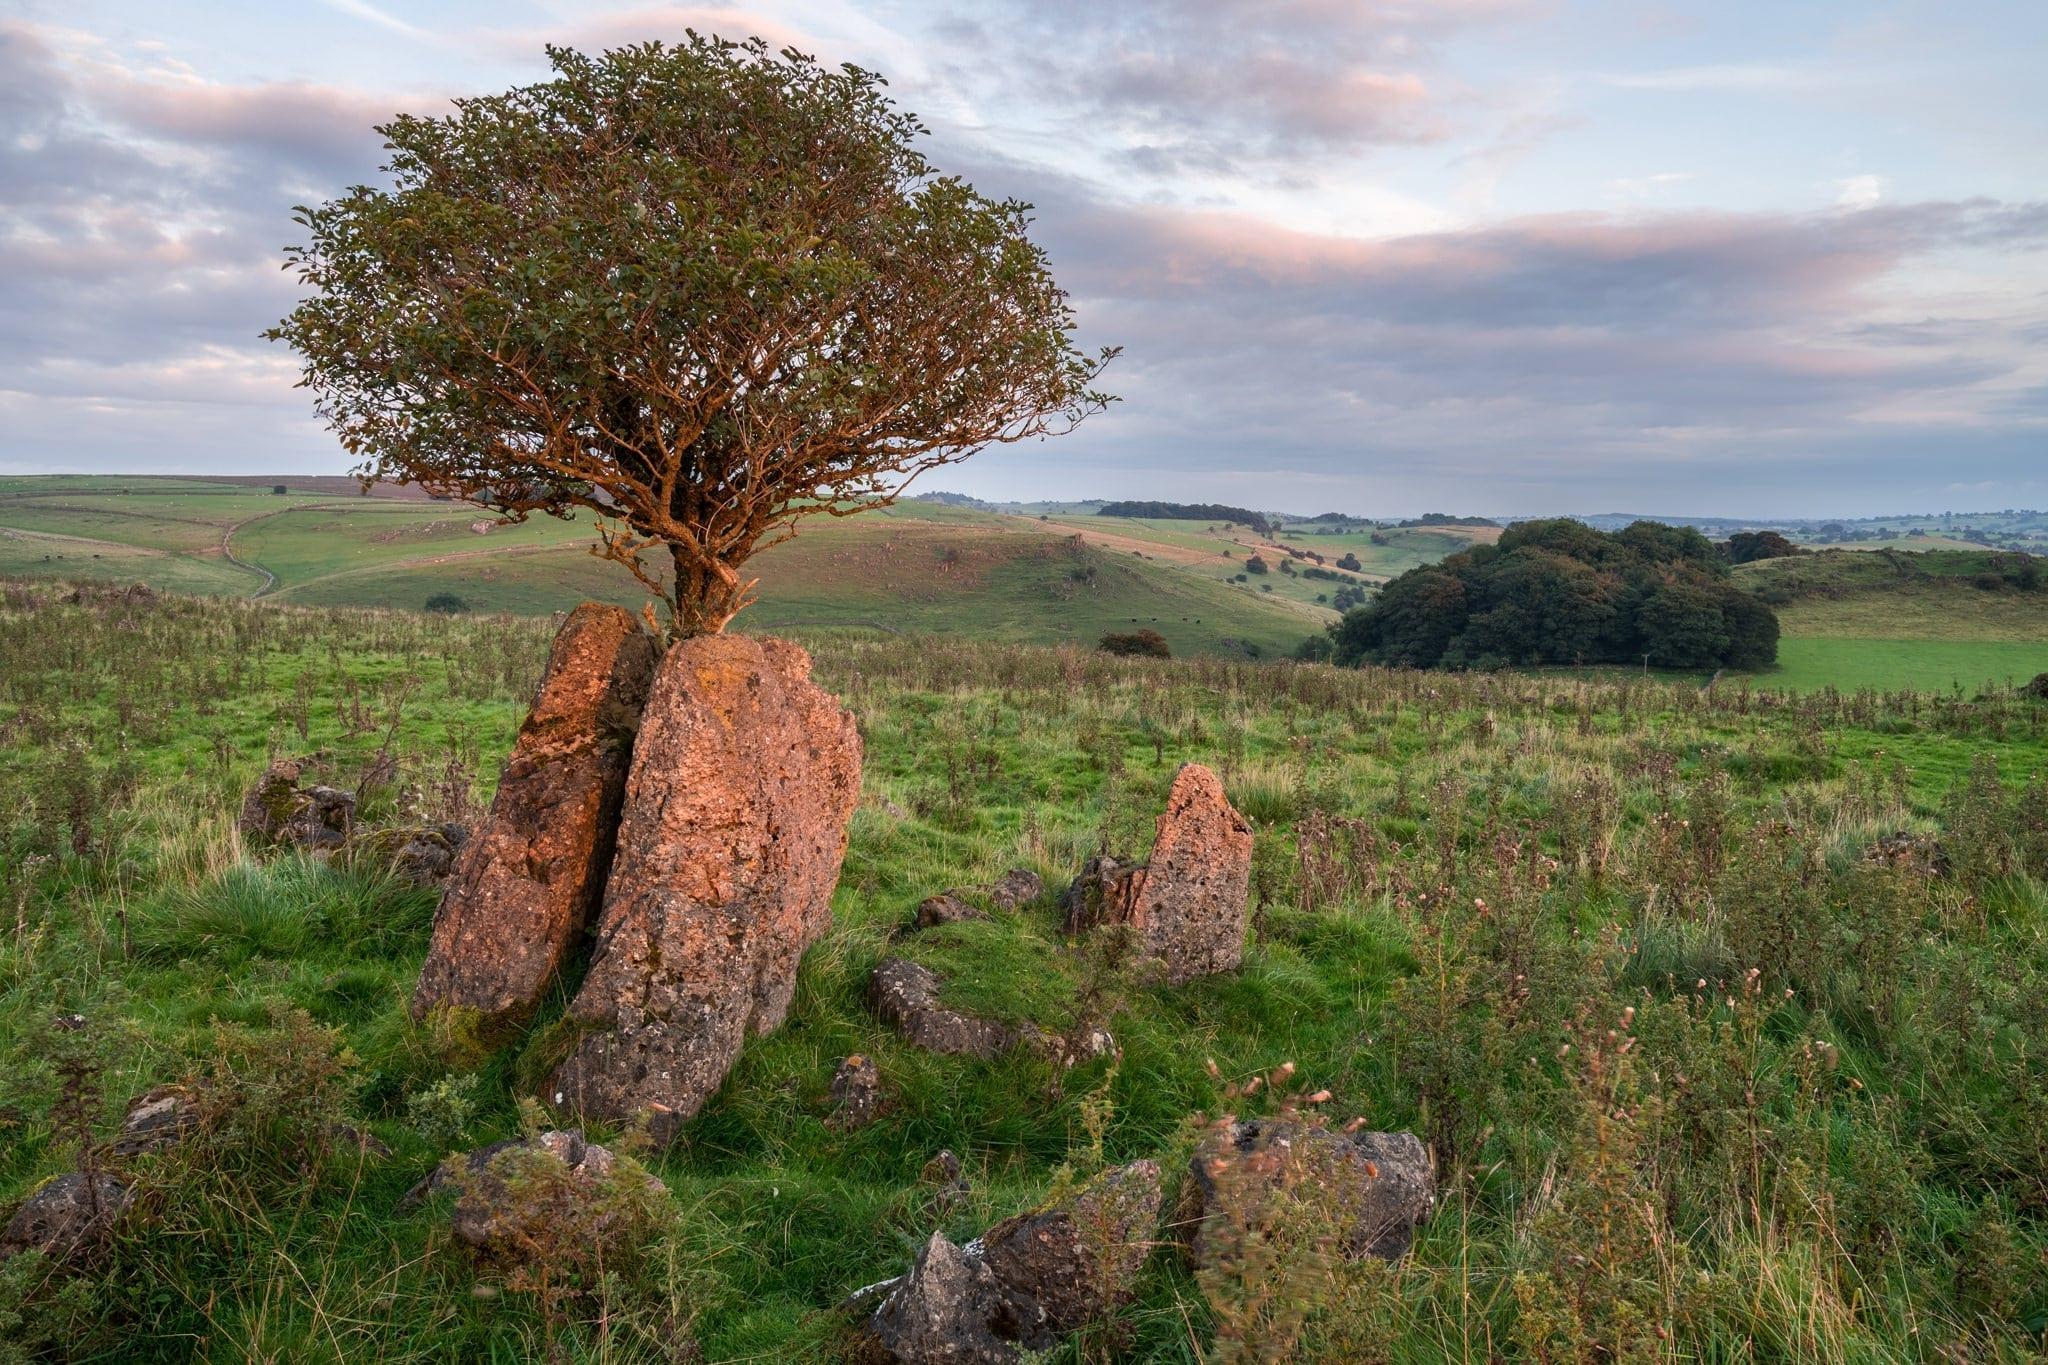 Roystone Rocks - South Peak District Limestone Photography Workshop